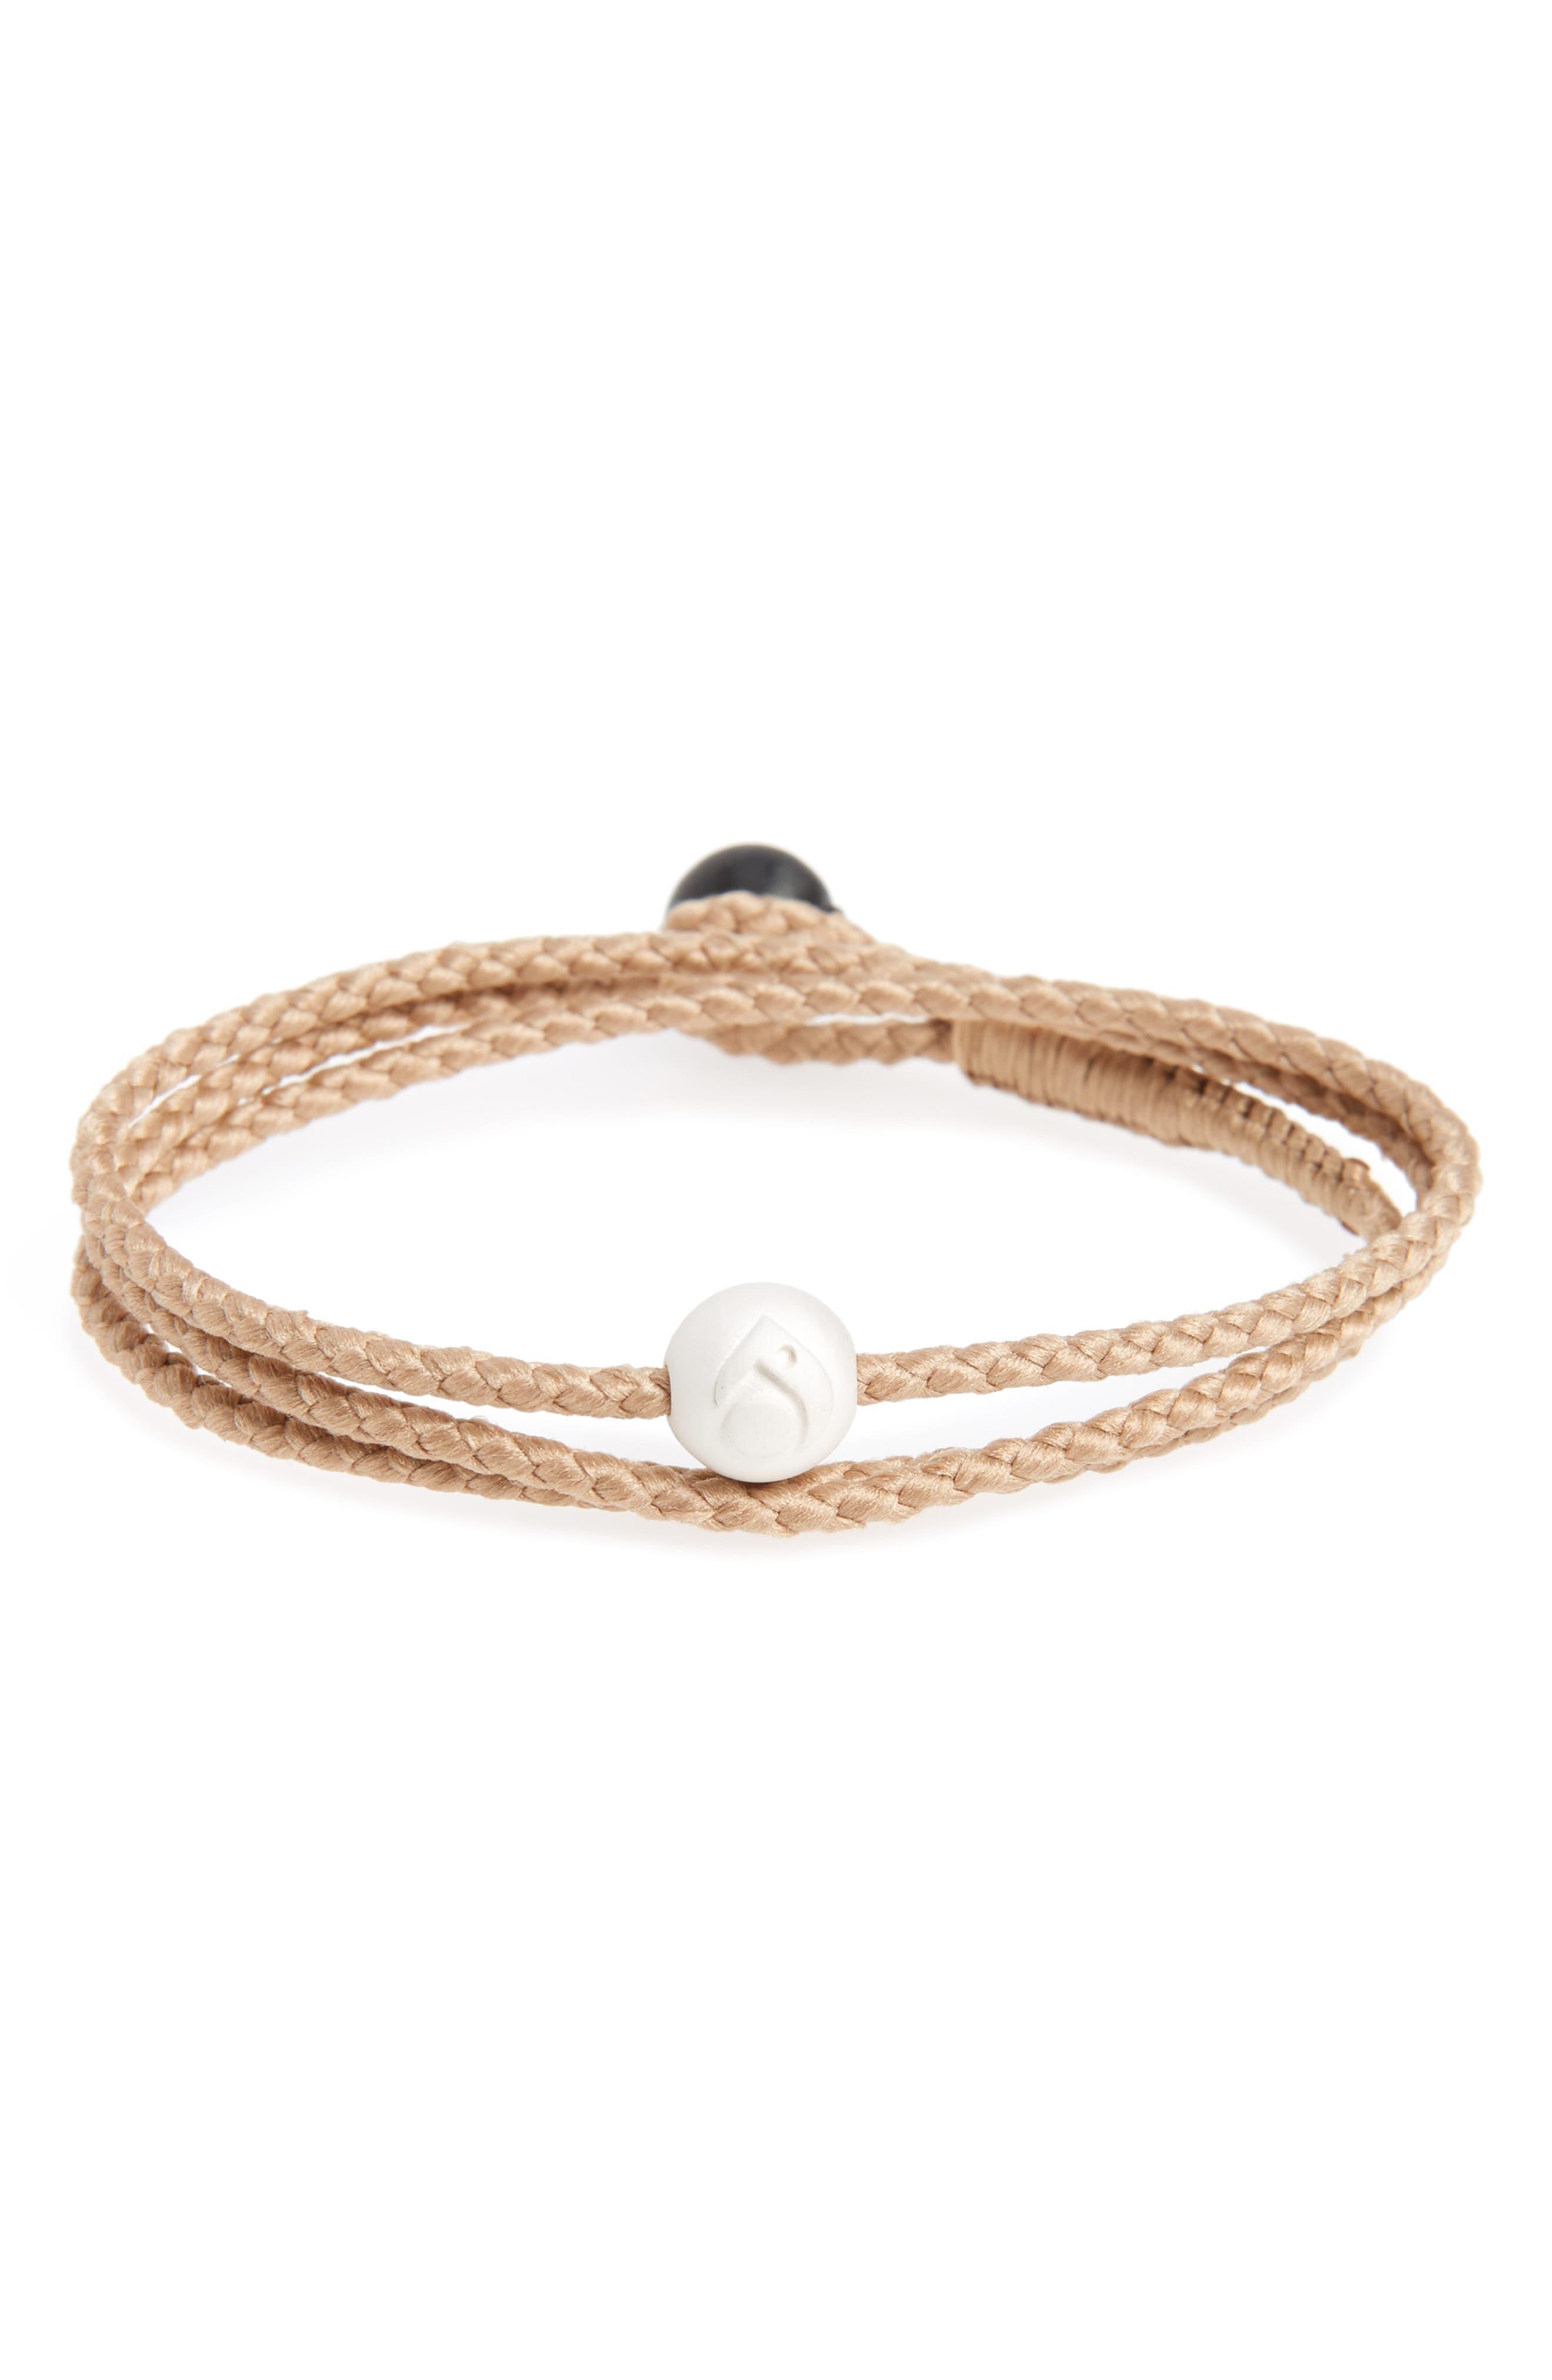 Lokai Sand Triple Wrap Bracelet